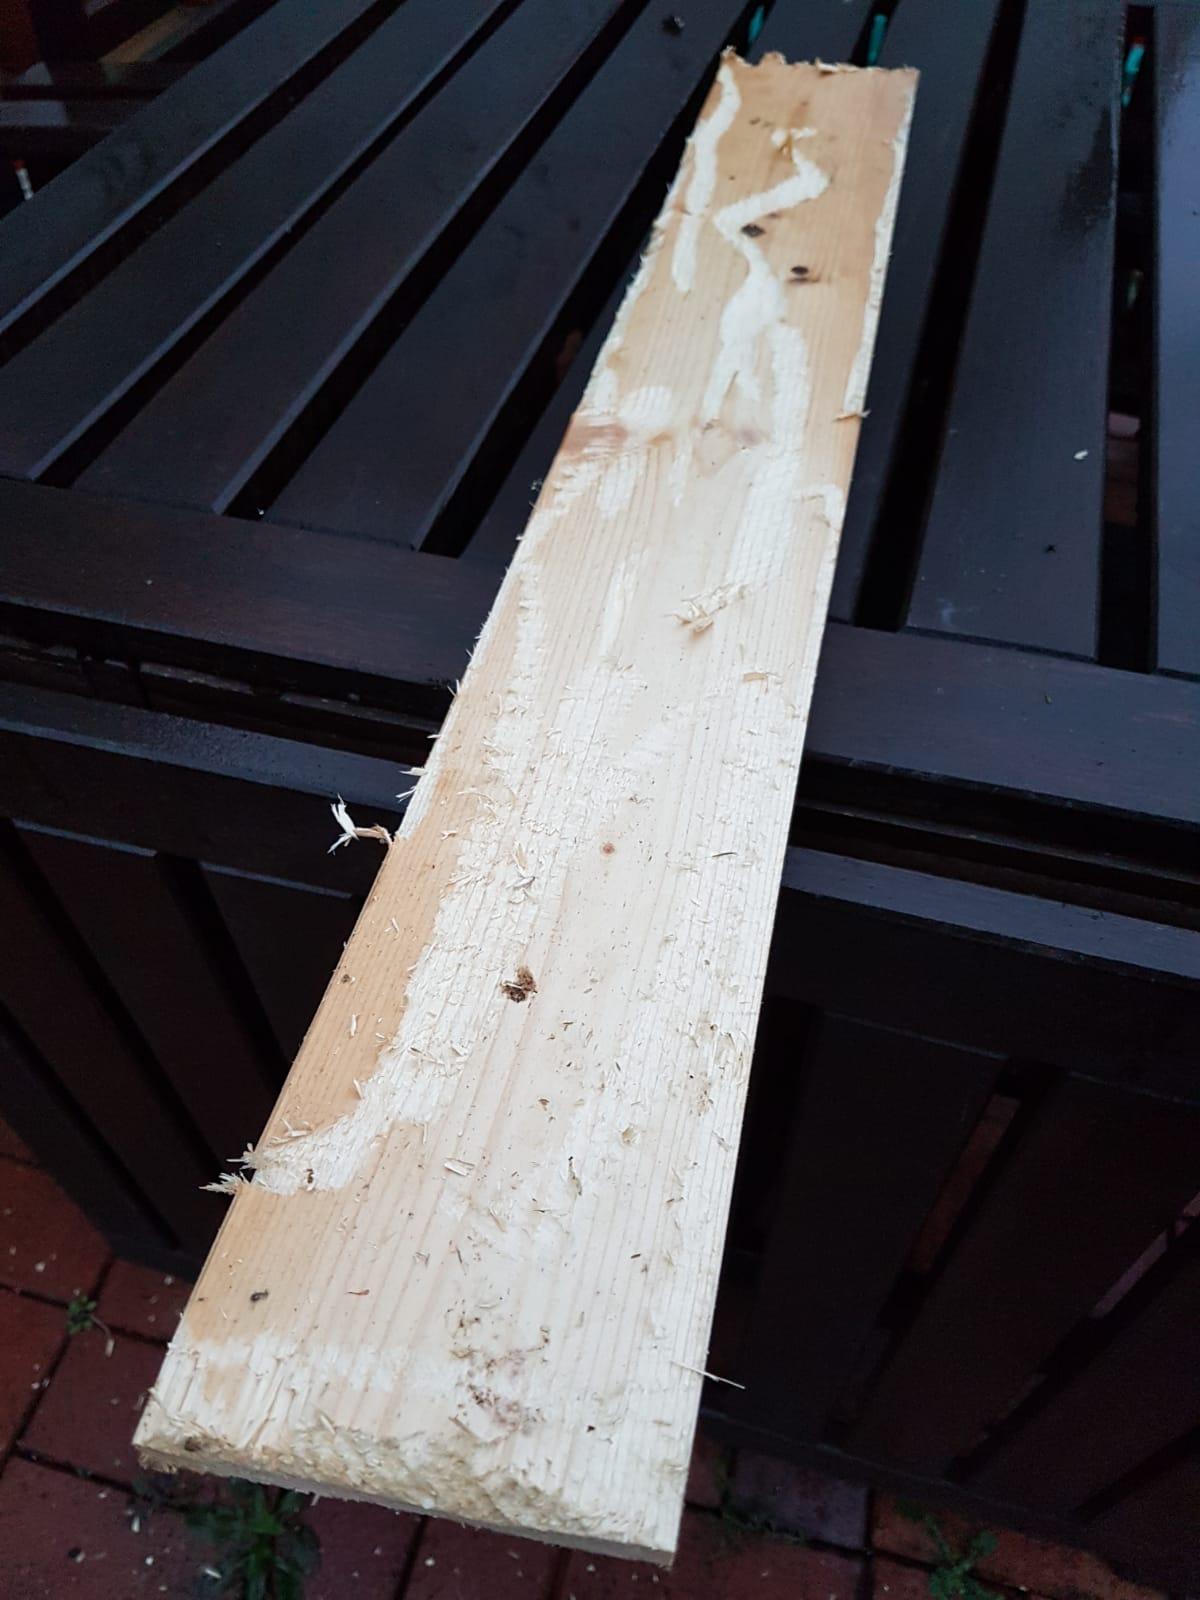 Holzbearbeitung mit Kettensäge